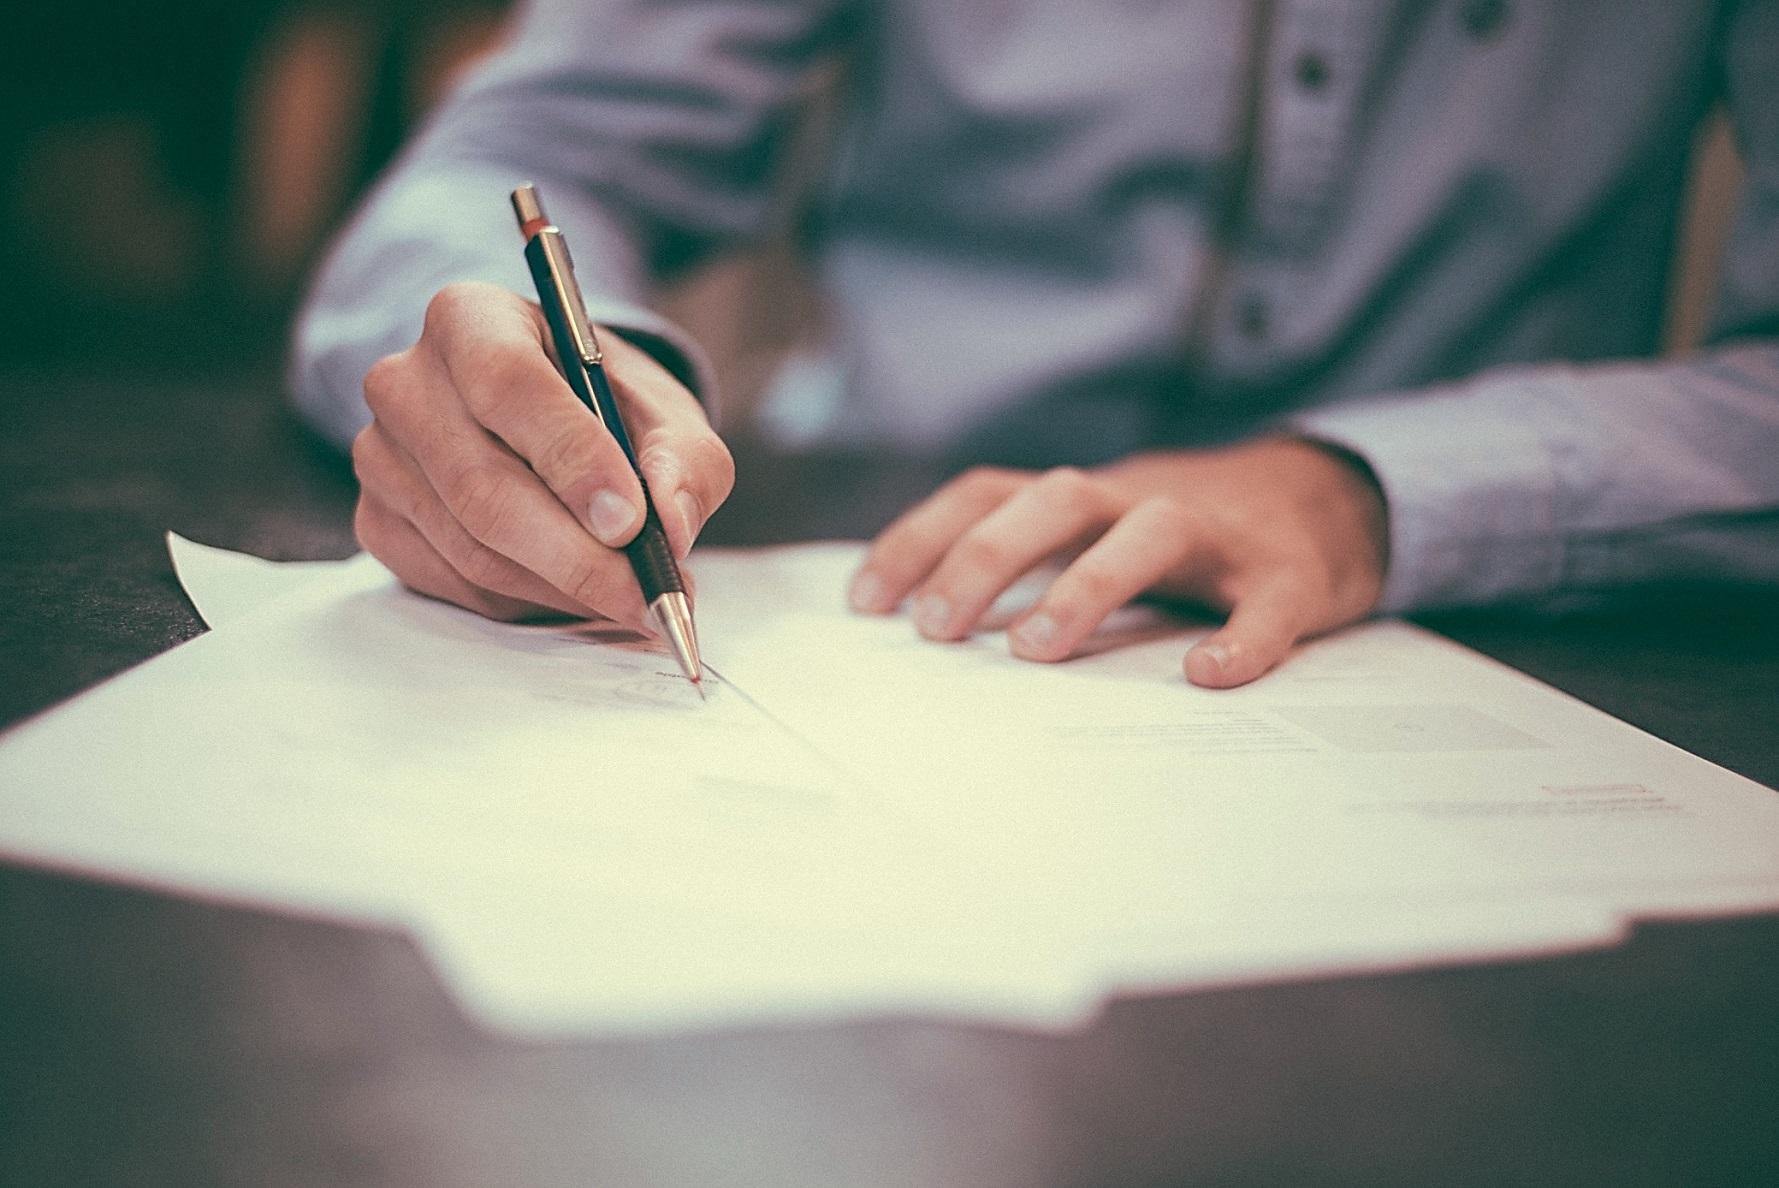 souscrire-contrat-obseques